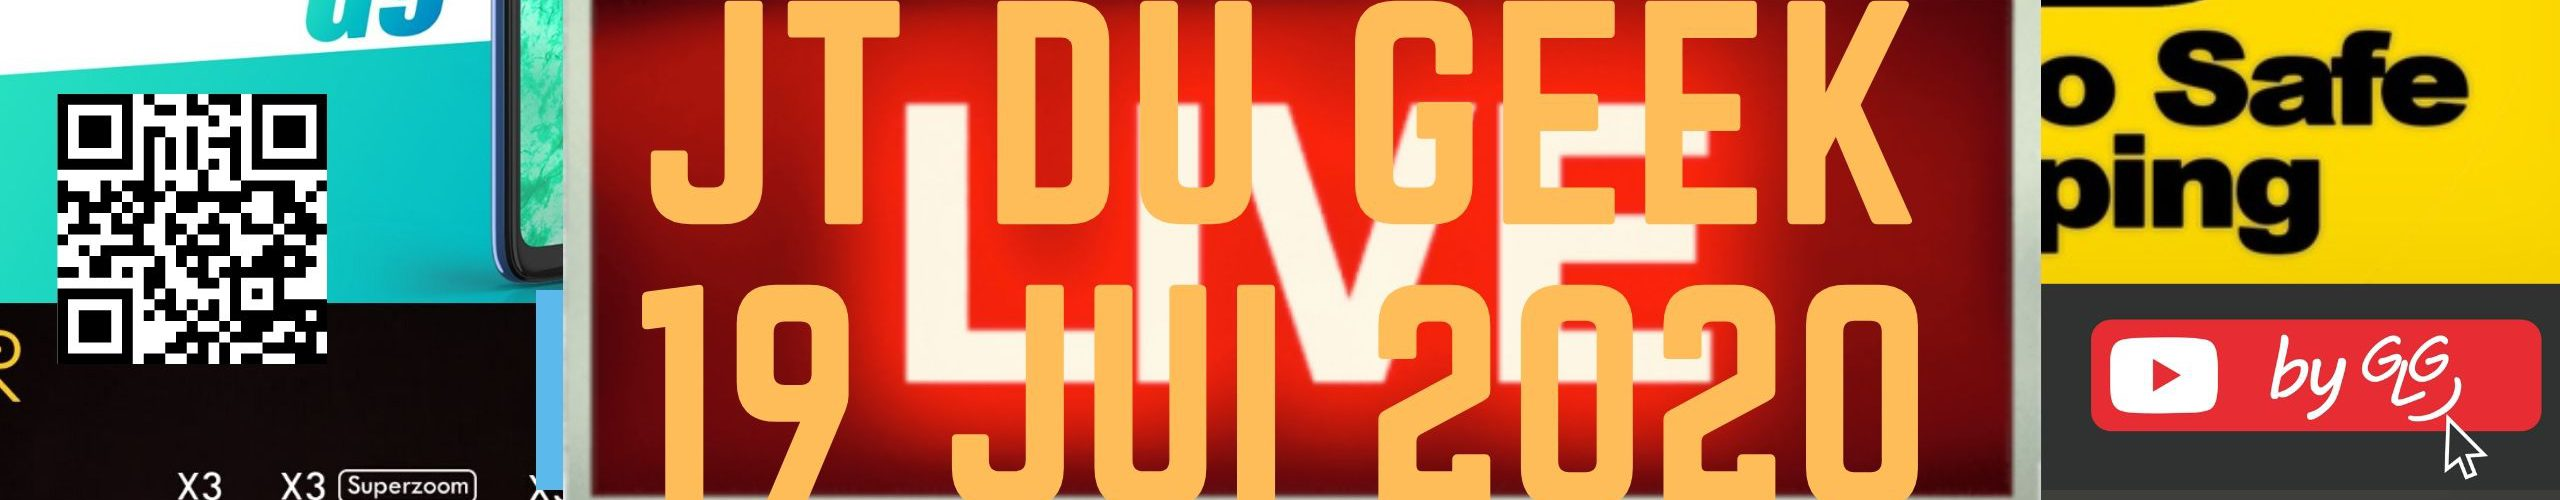 Glg Part En Live Jt Du Geek 19 Juillet